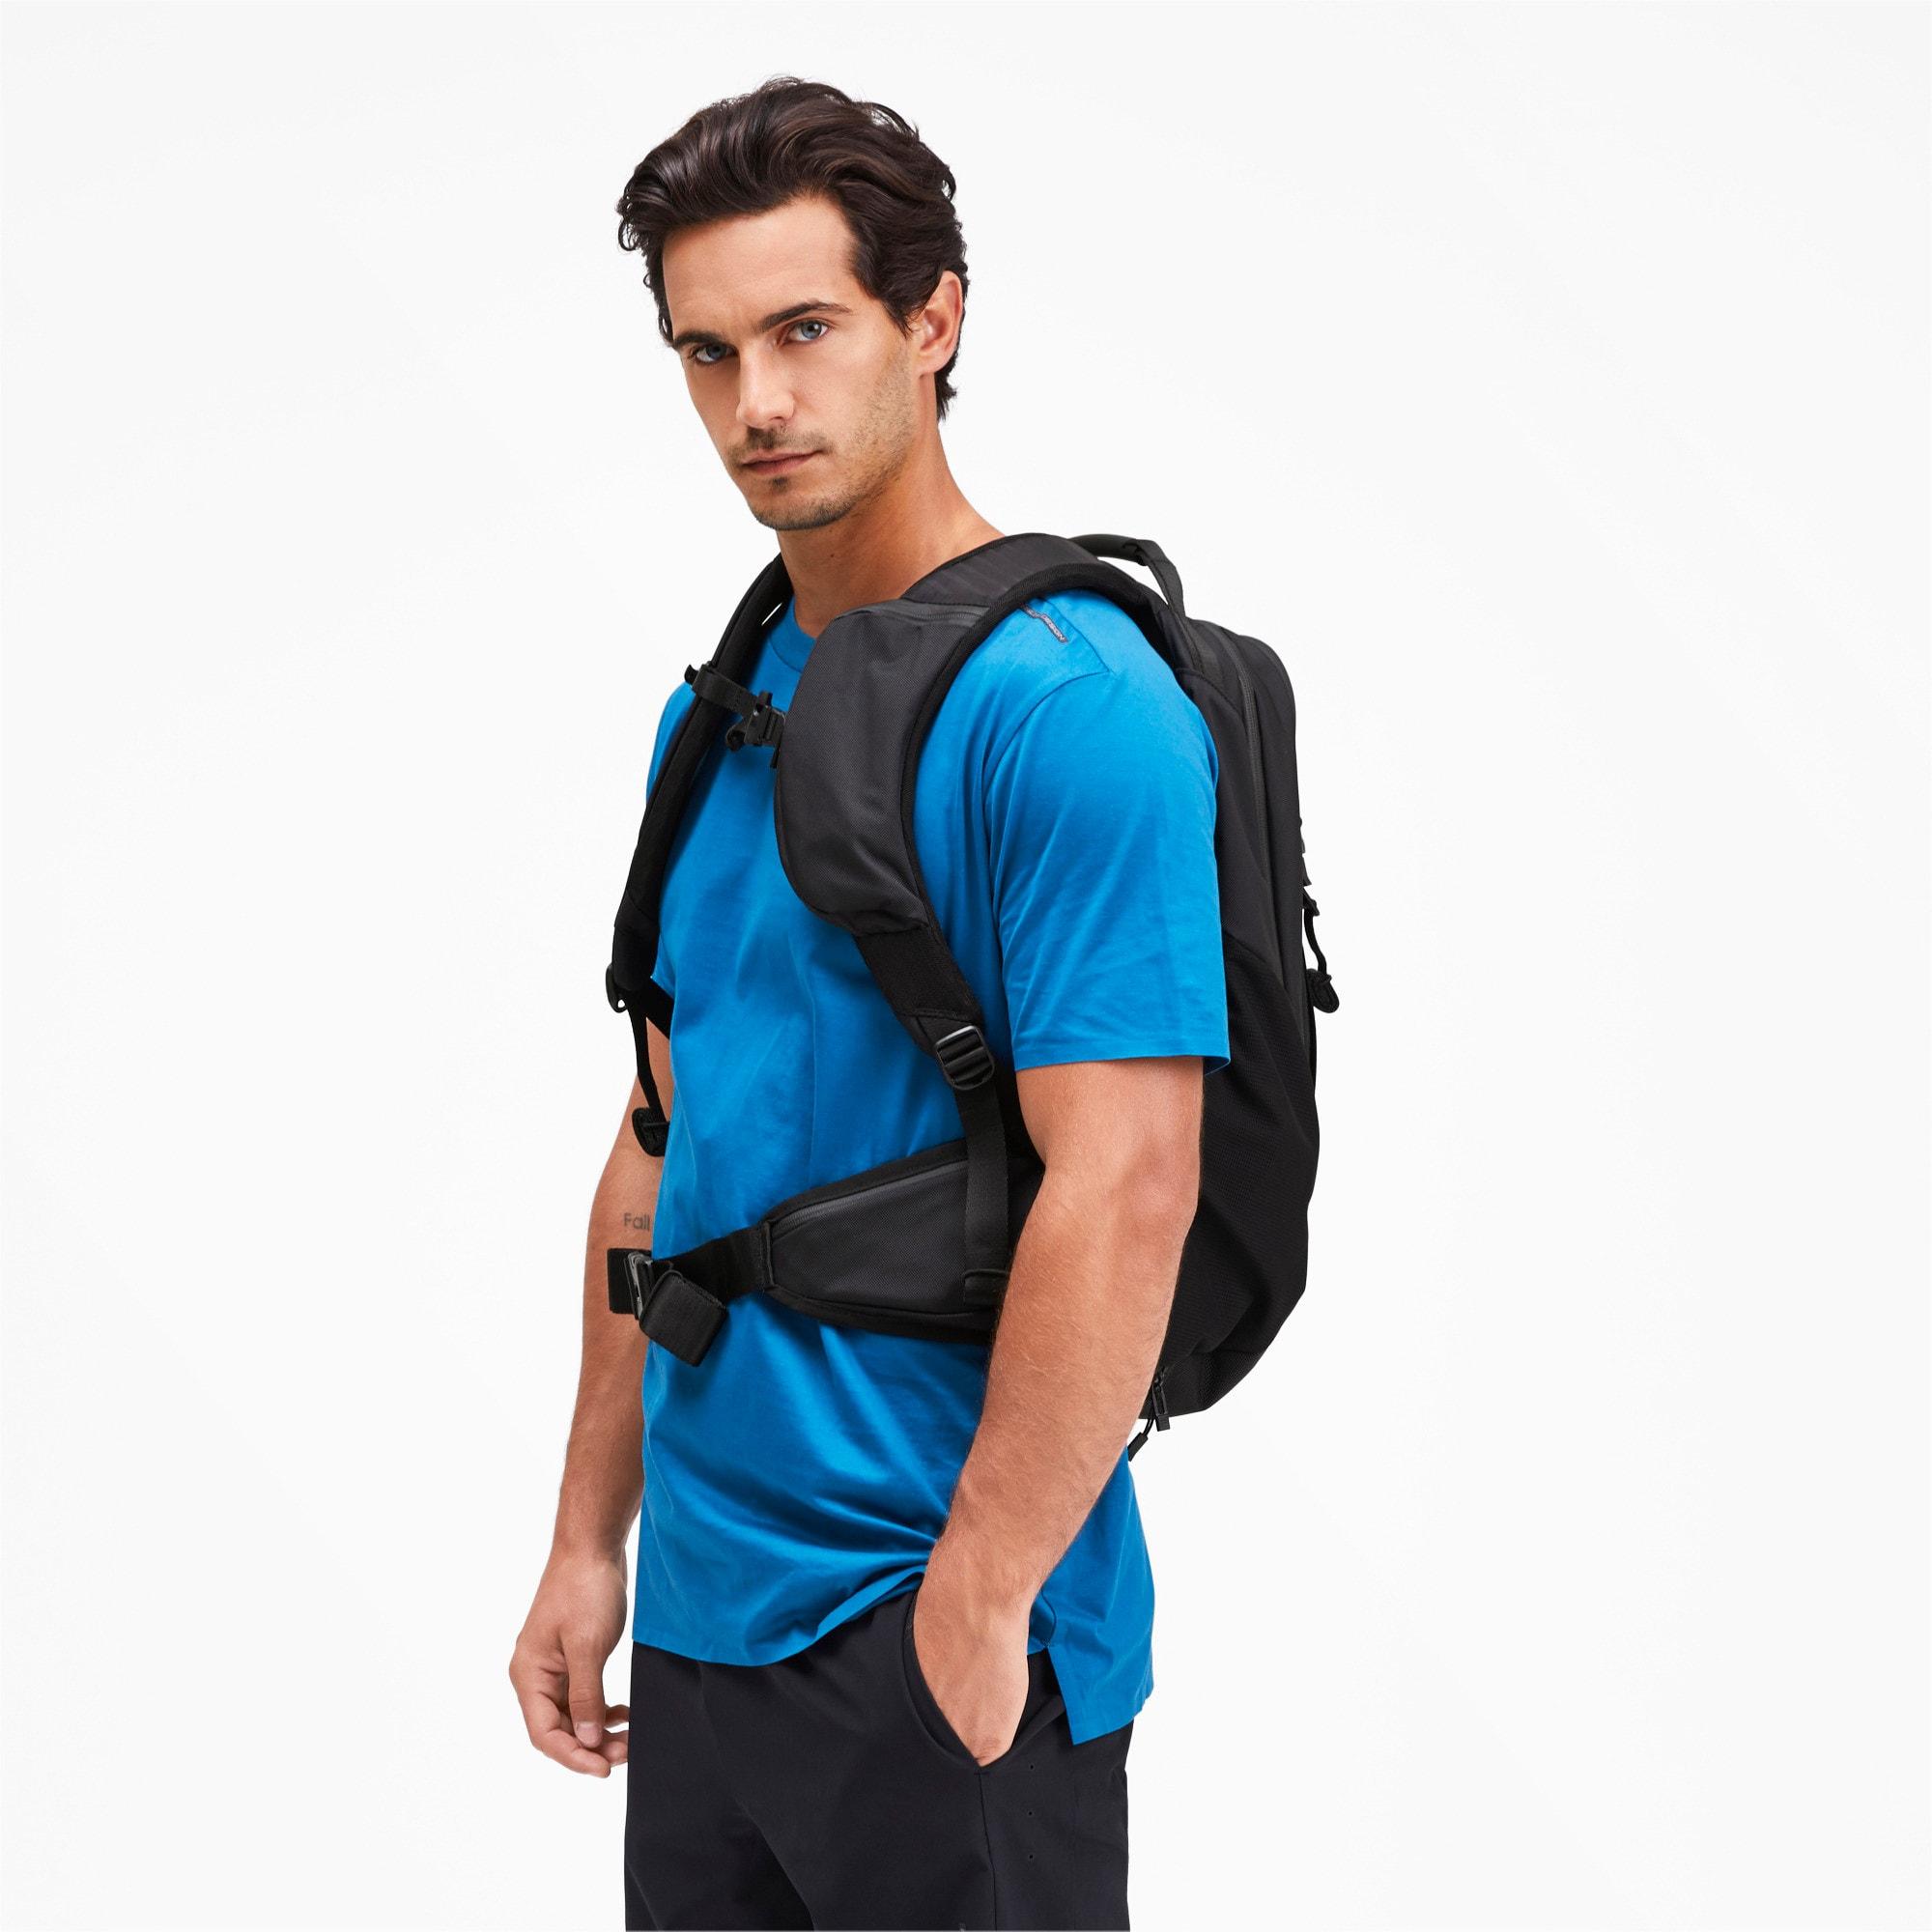 Thumbnail 4 of Porsche Design evoKNIT Active Backpack, Puma Black, medium